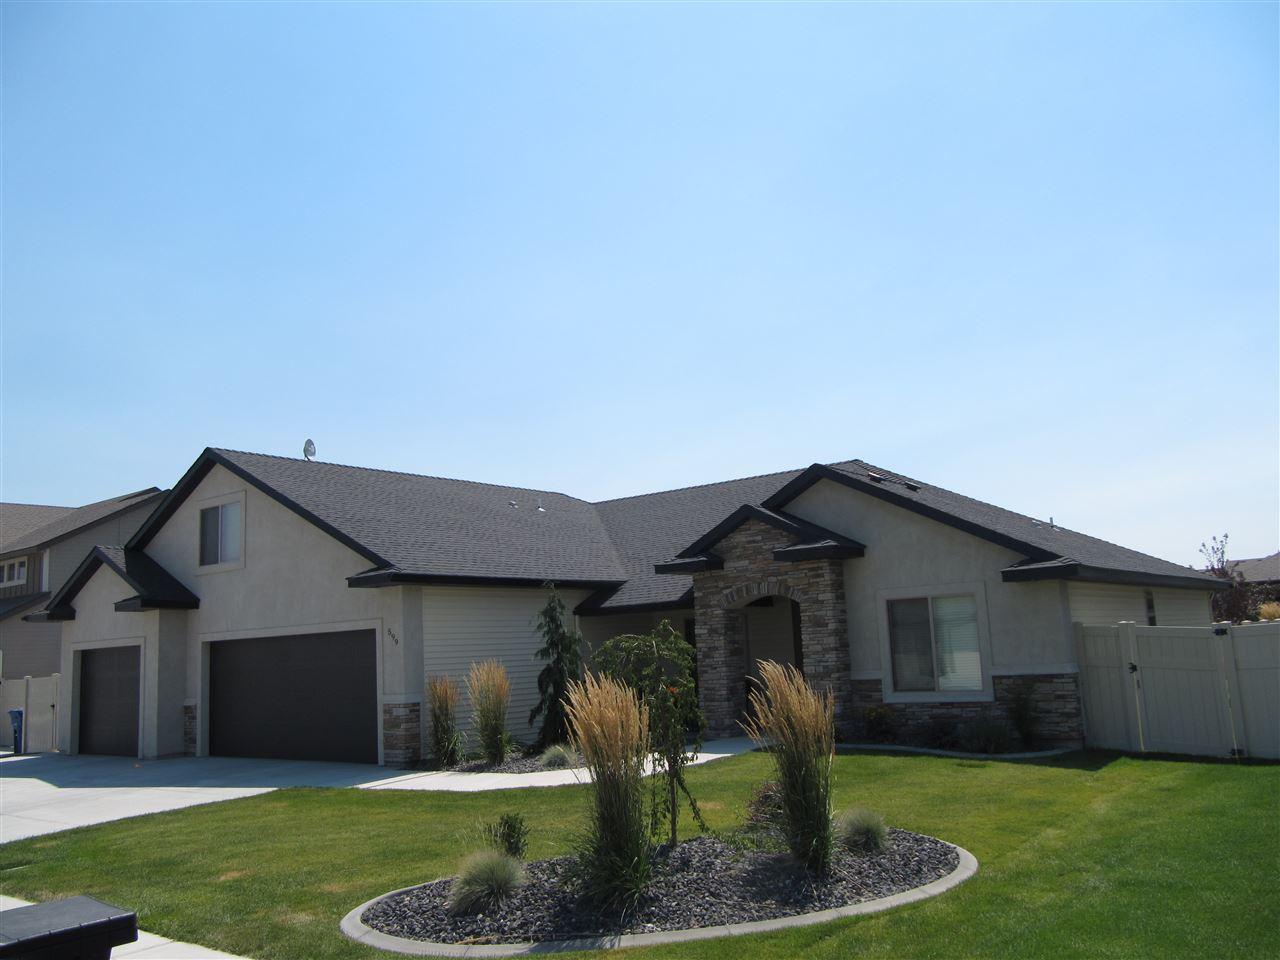 599 Reese Road, Twin Falls, ID 83301